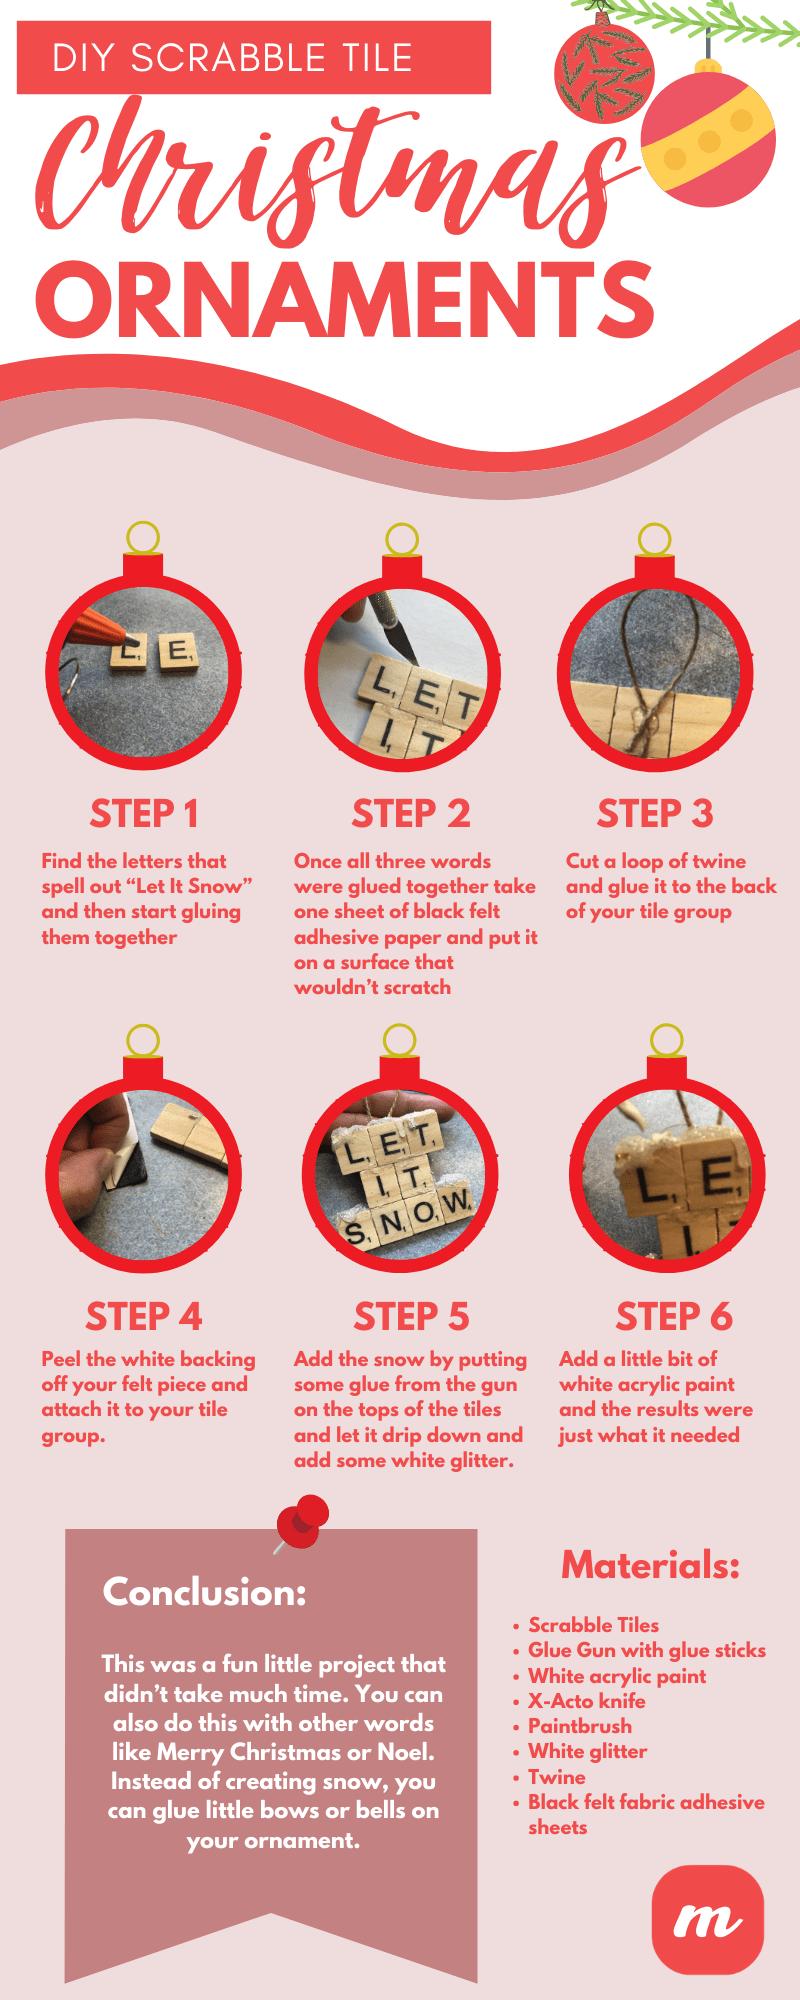 DIY Scrabble Tile Christmas Ornaments - Infographic